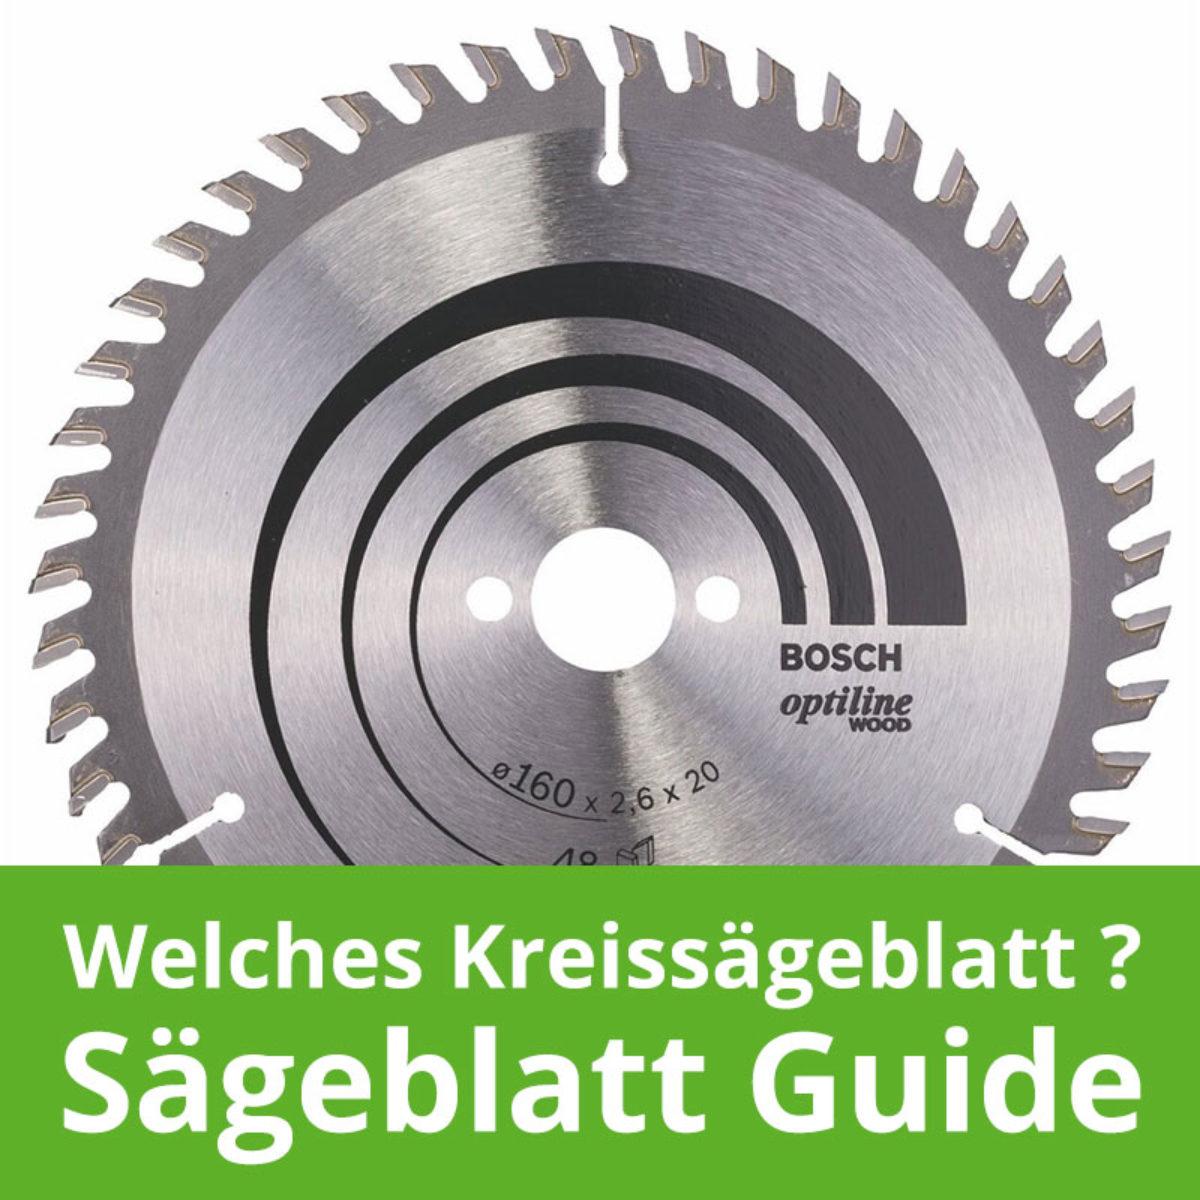 Kreissägeblatt Ø165mm 48 Zähne TCT-Klinge für Holz Stahl Aluminium Metall DE